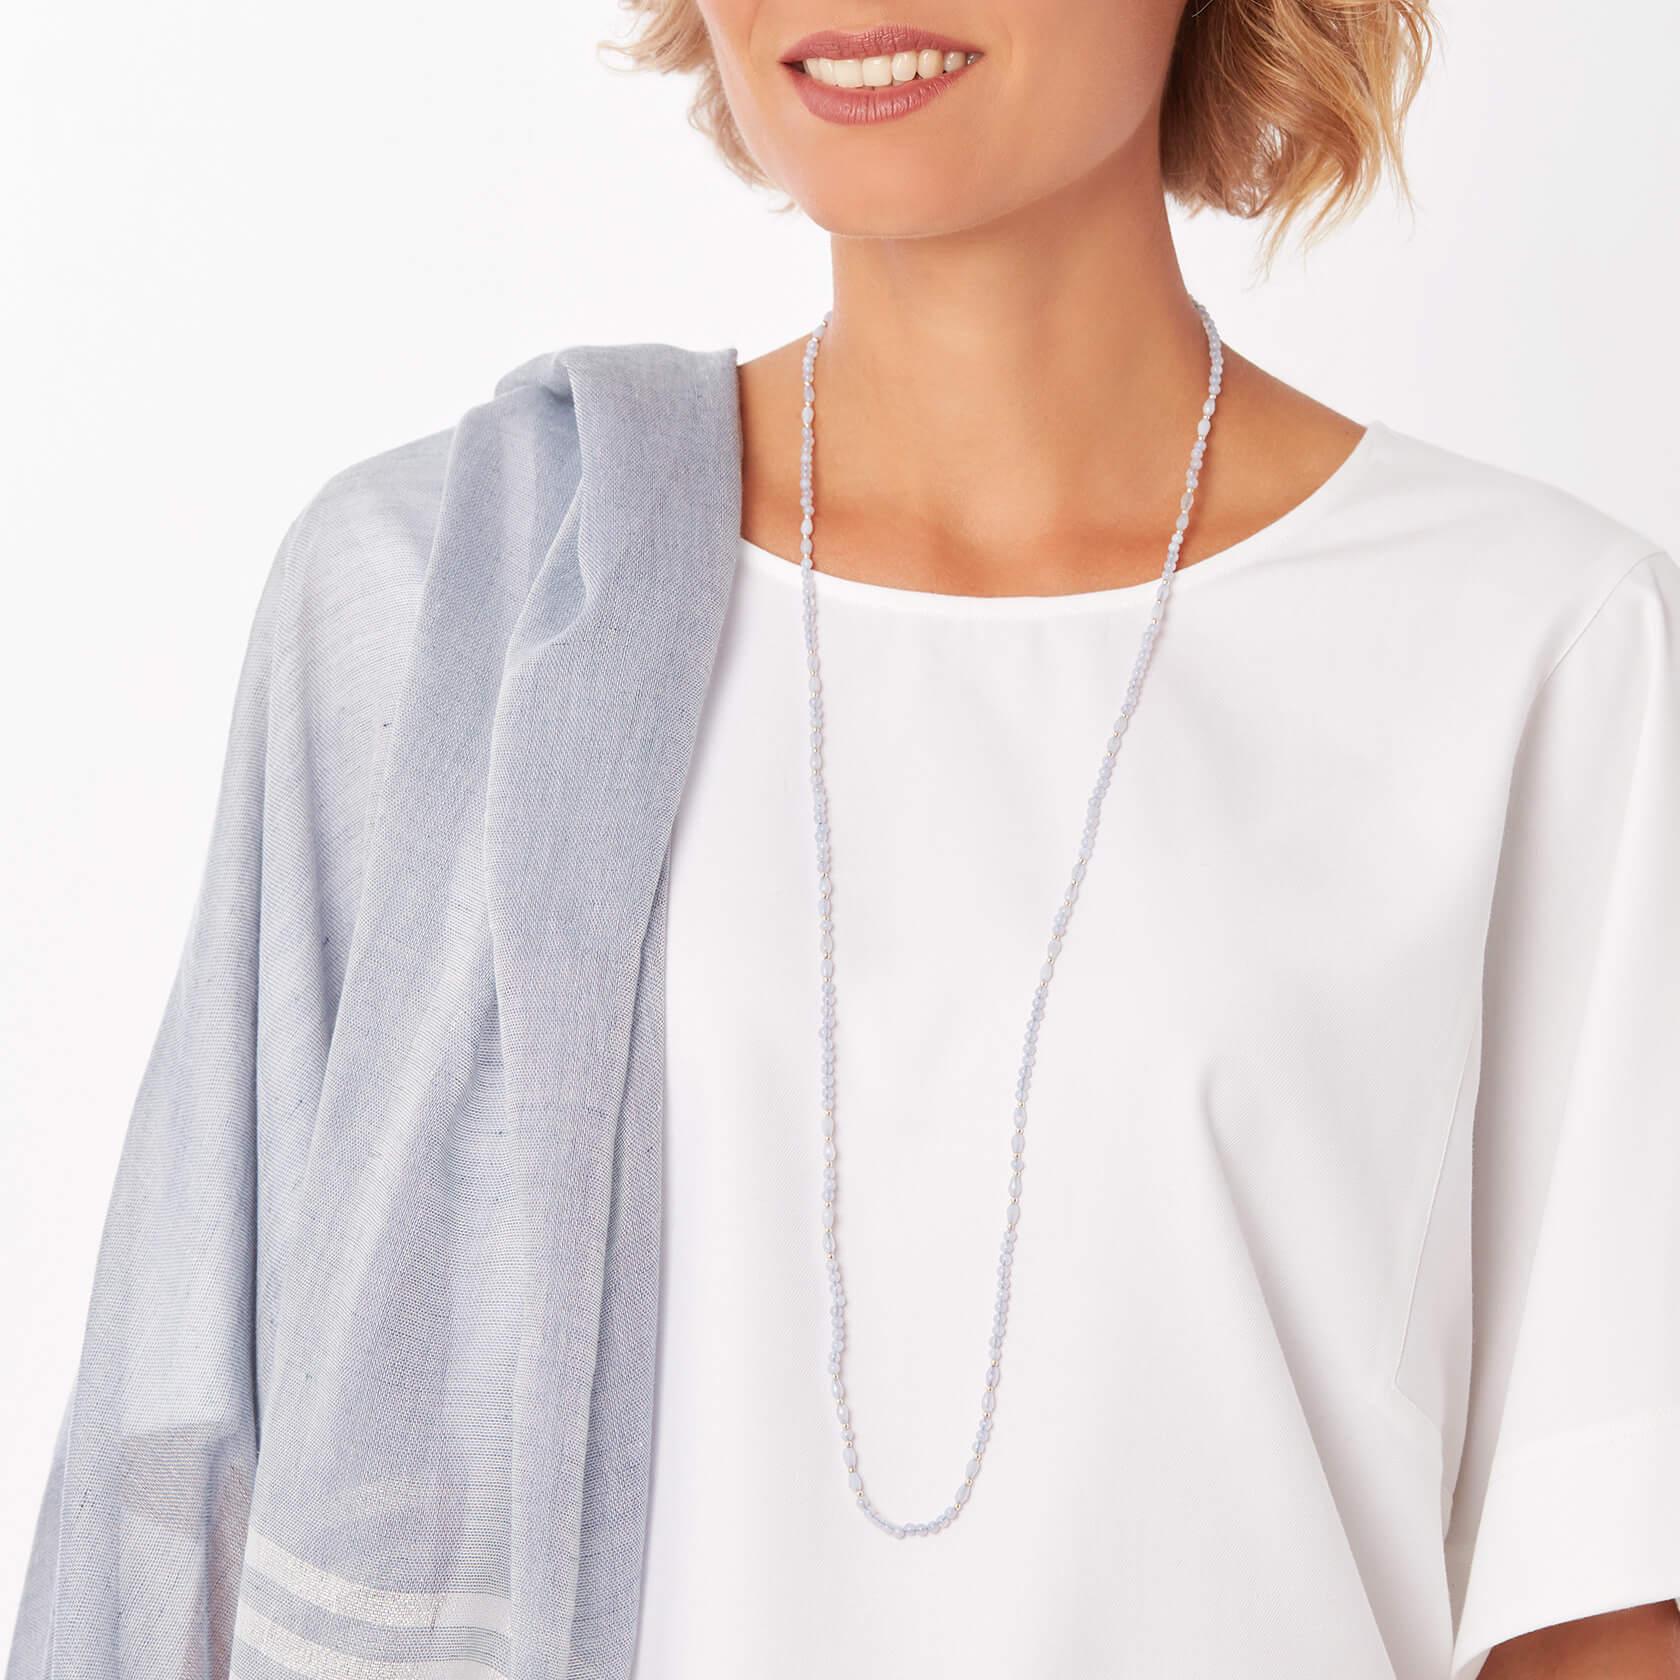 Neptuno Chalcedony long necklace